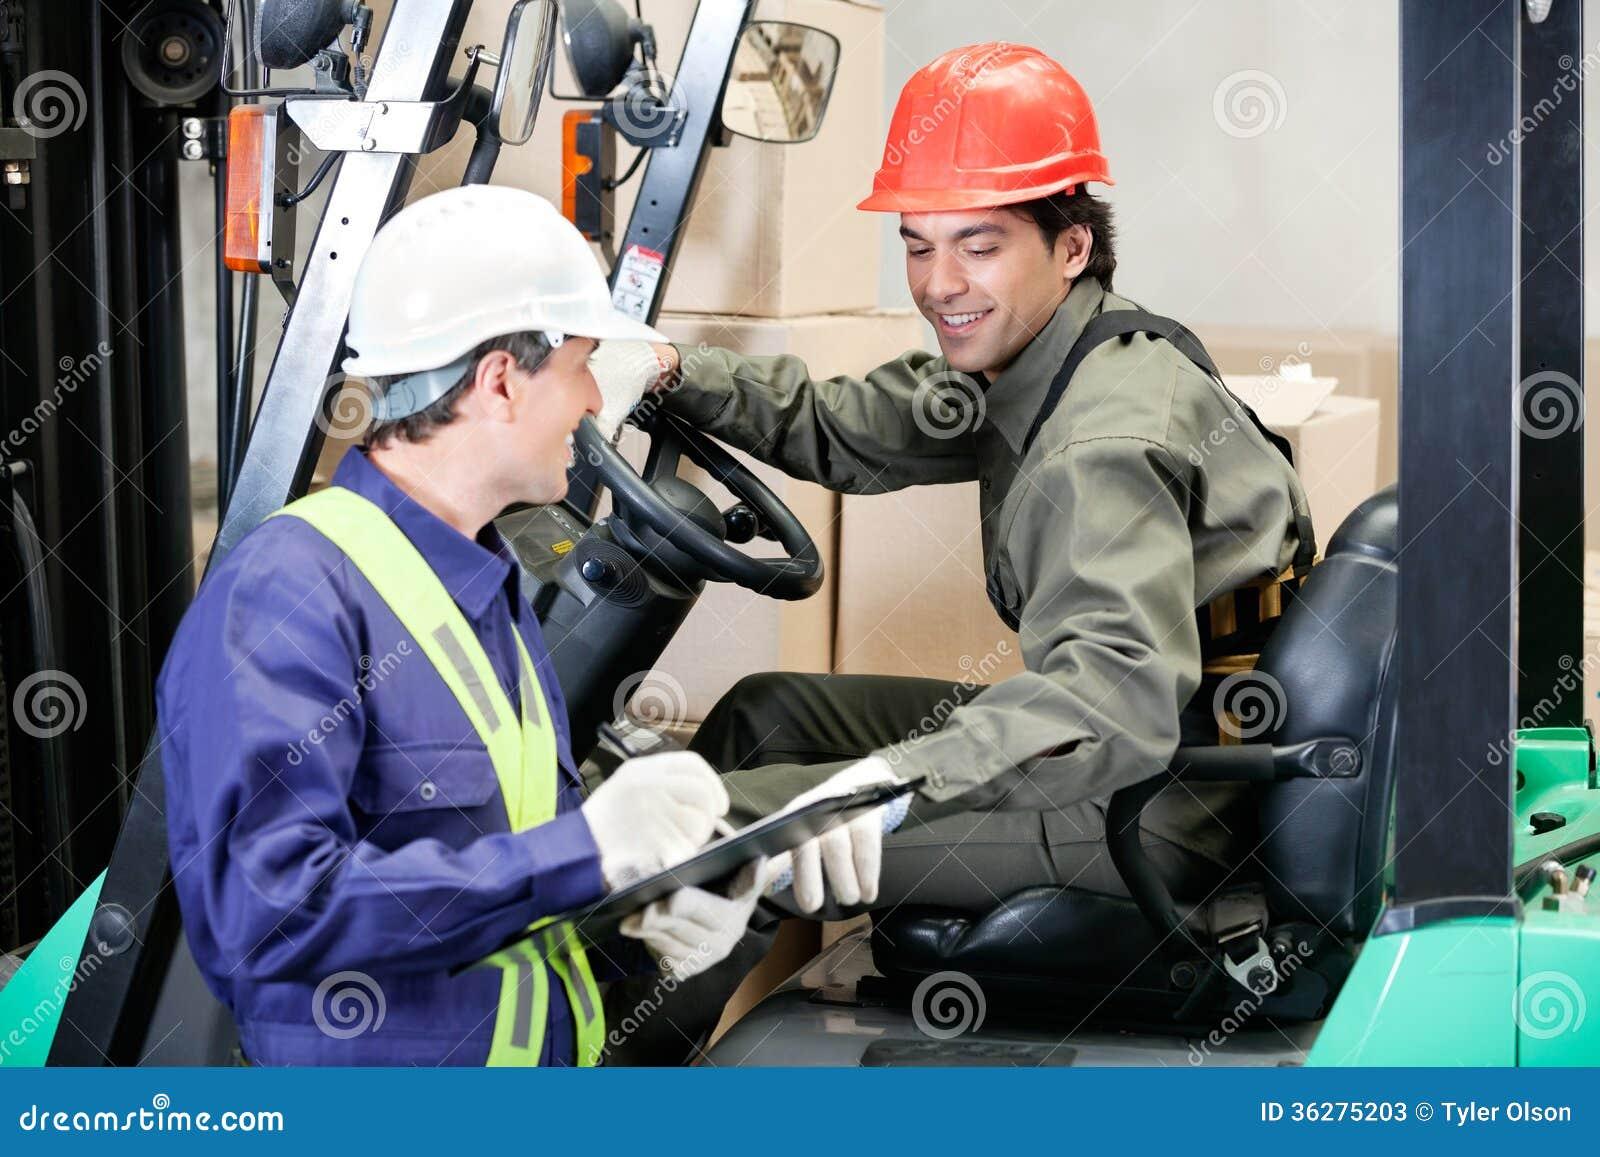 Vorkheftruckbestuurder Communicating With Supervisor